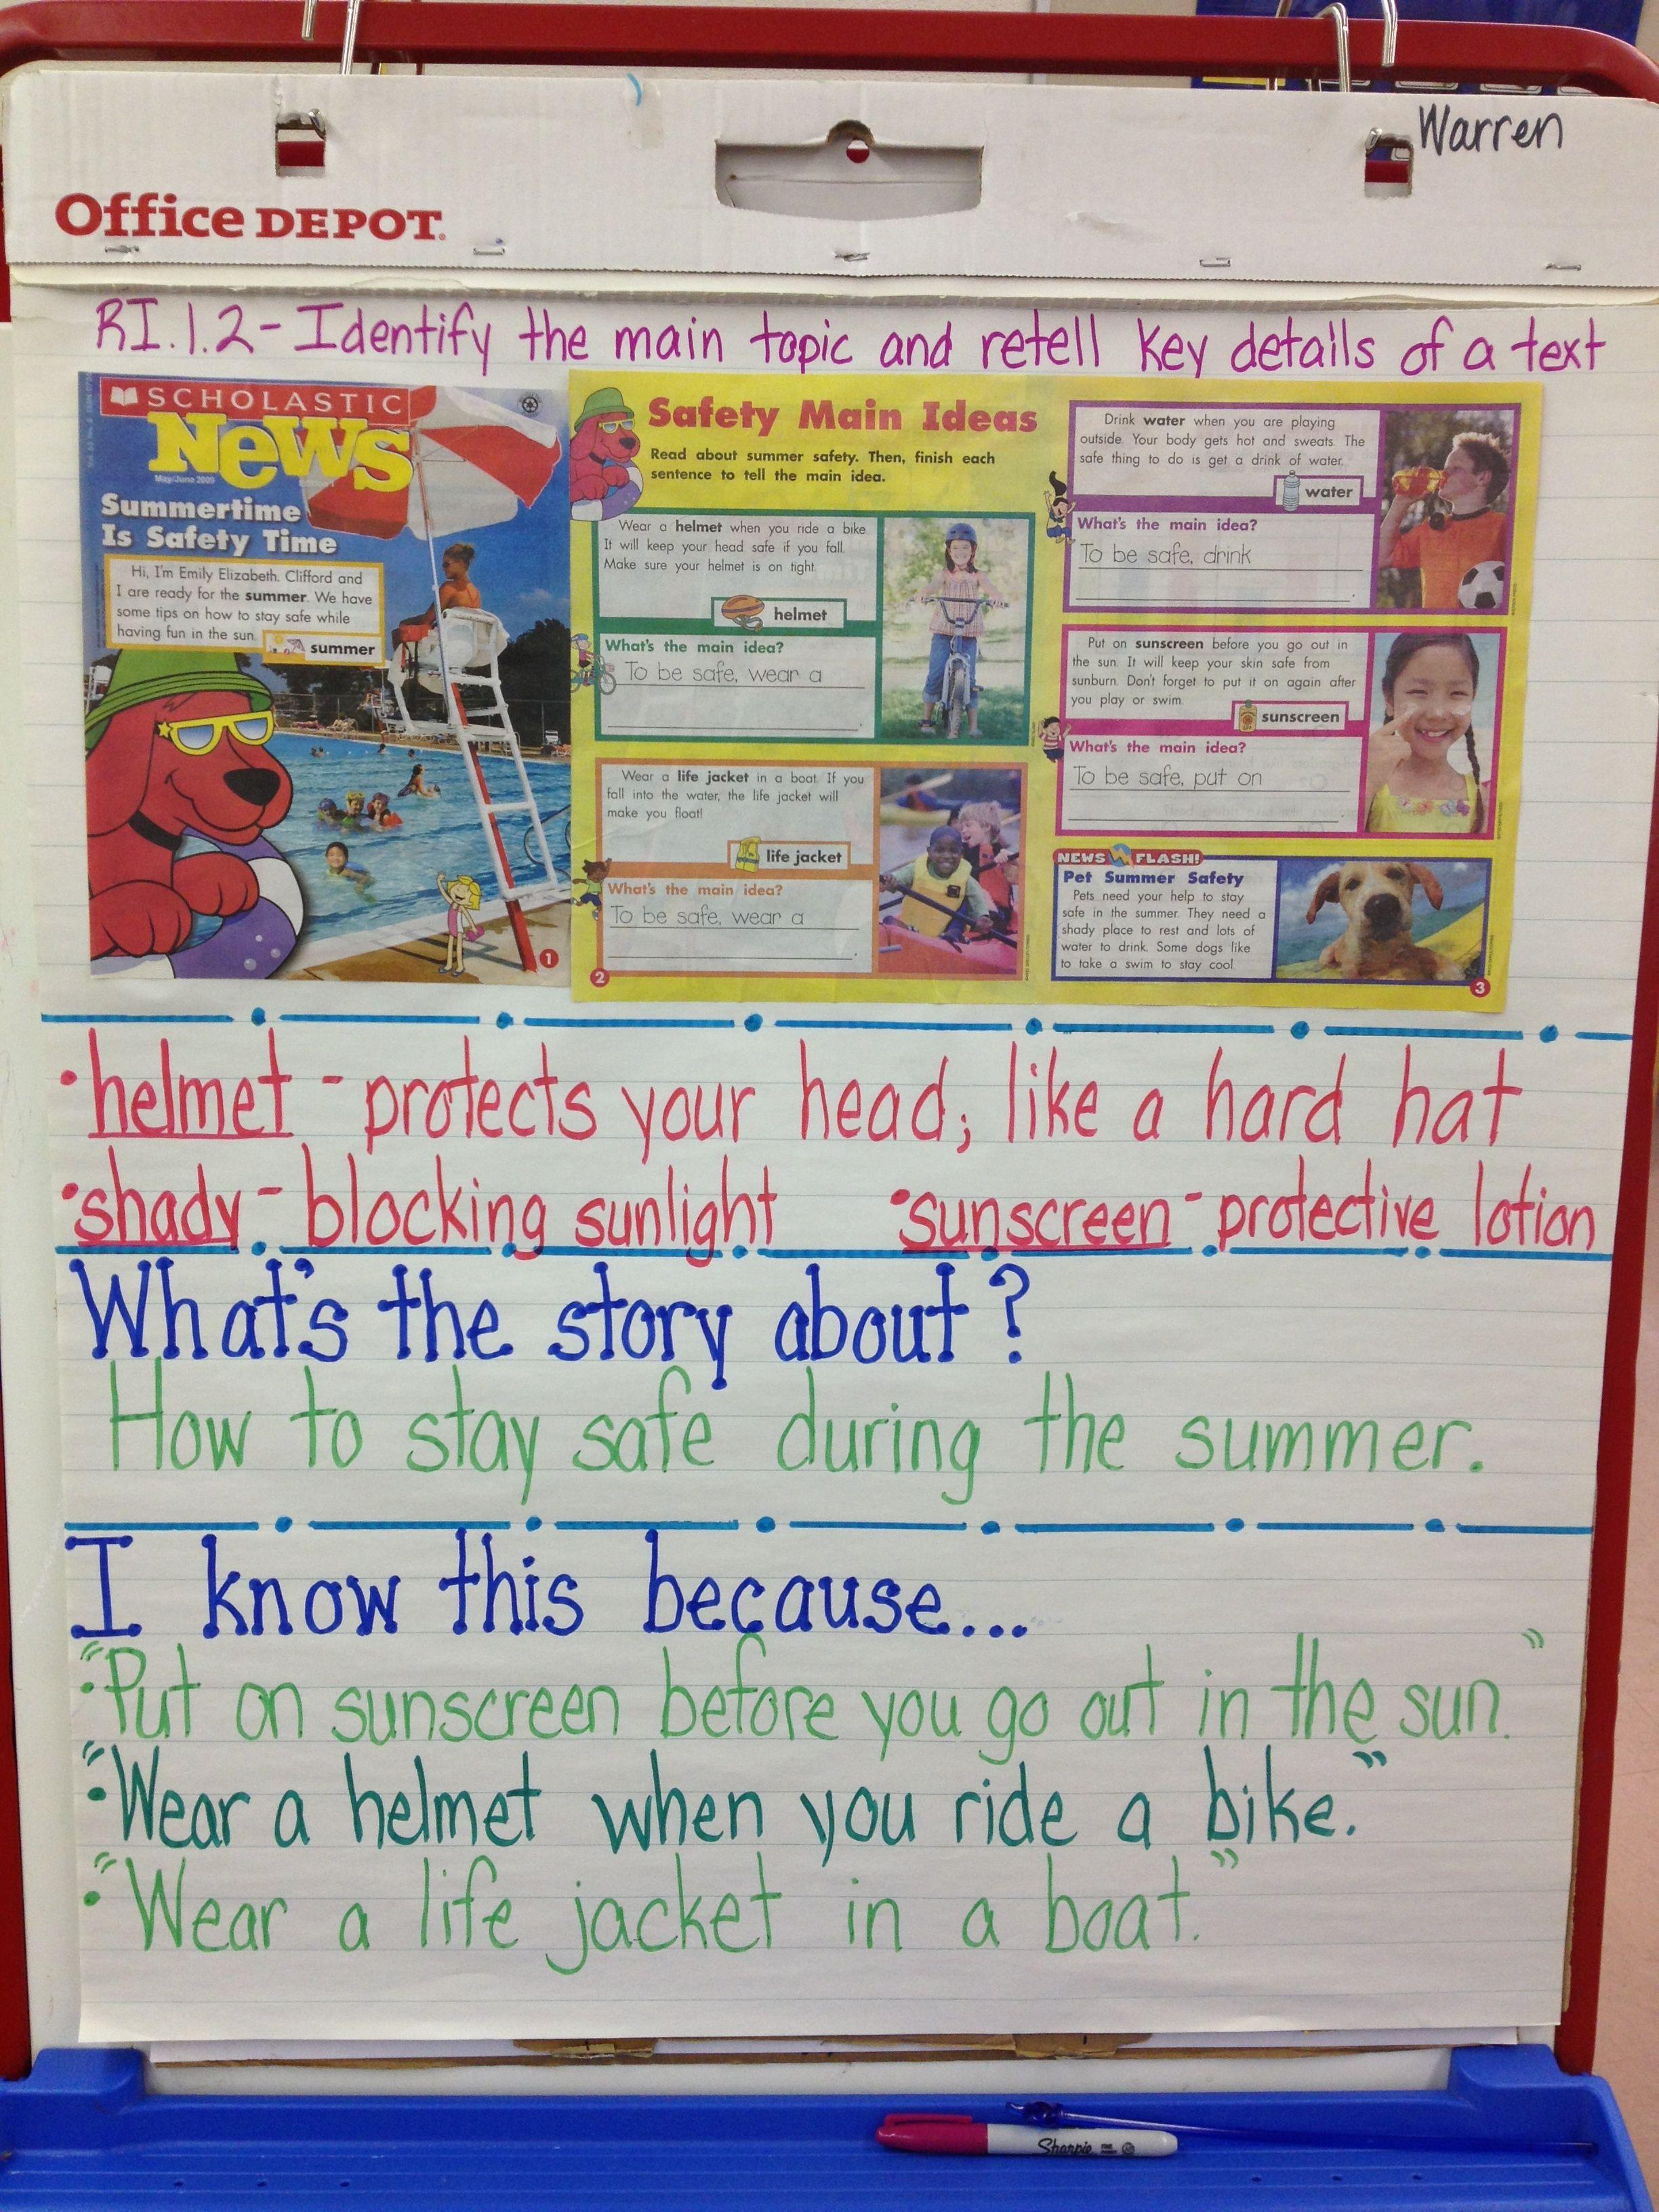 Scholastic News Article